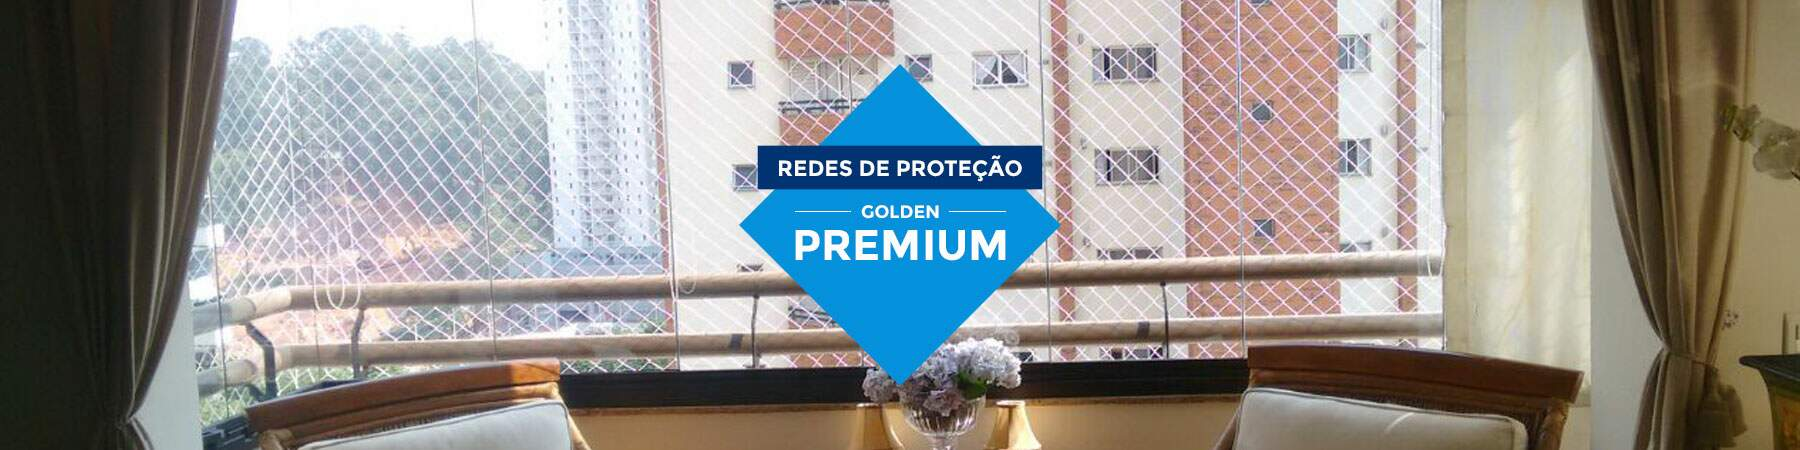 rede-de-protecao-golden-premium04